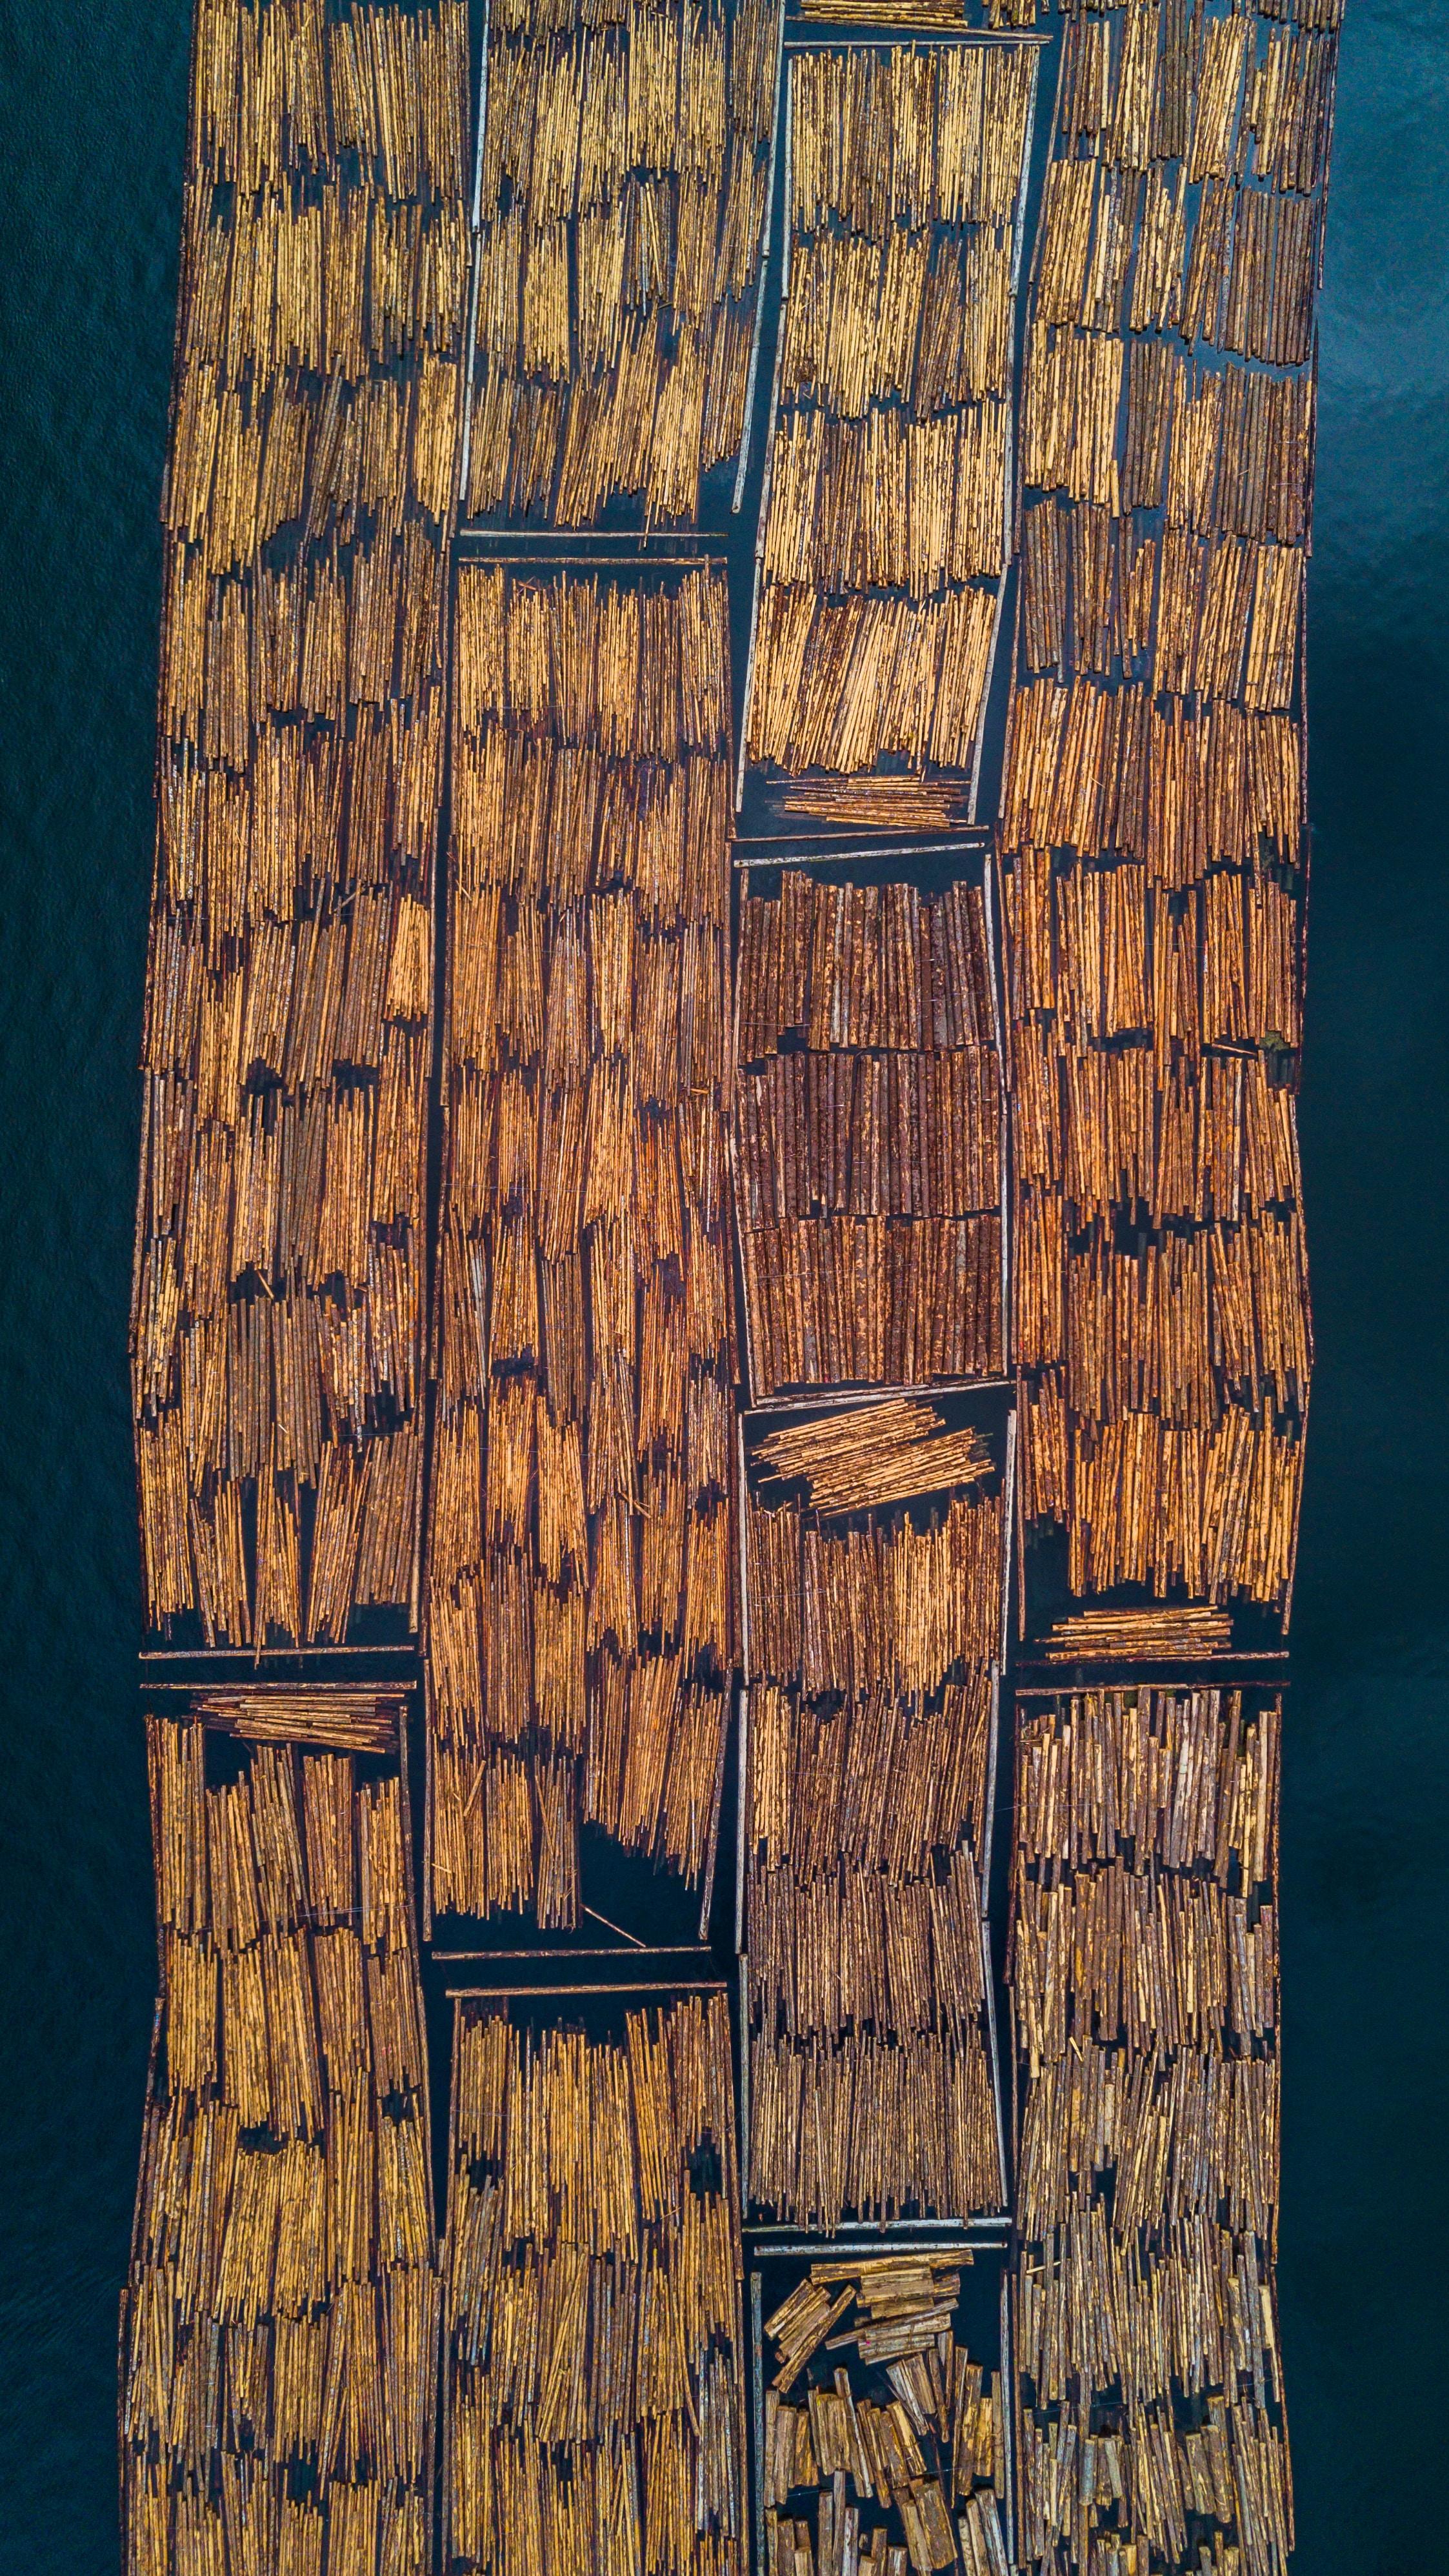 brown wood logs on body of water